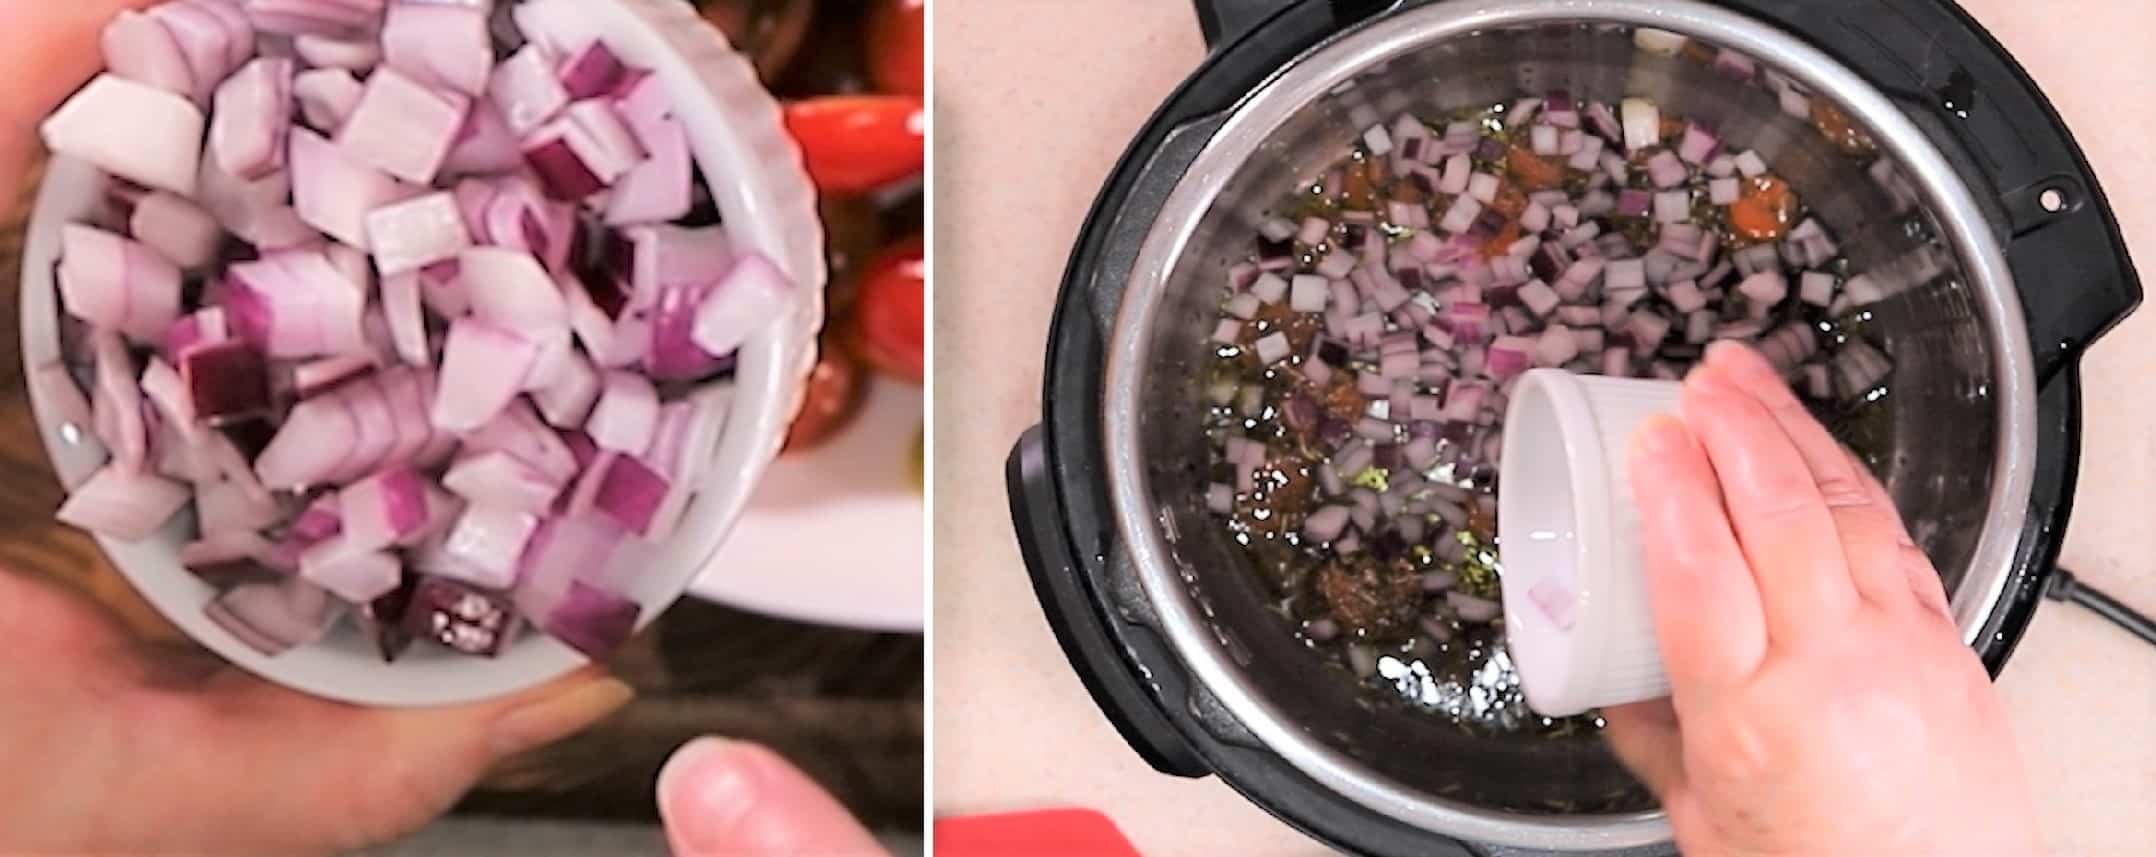 Diced onions in a ramekin, getting dumped into pressure cooker